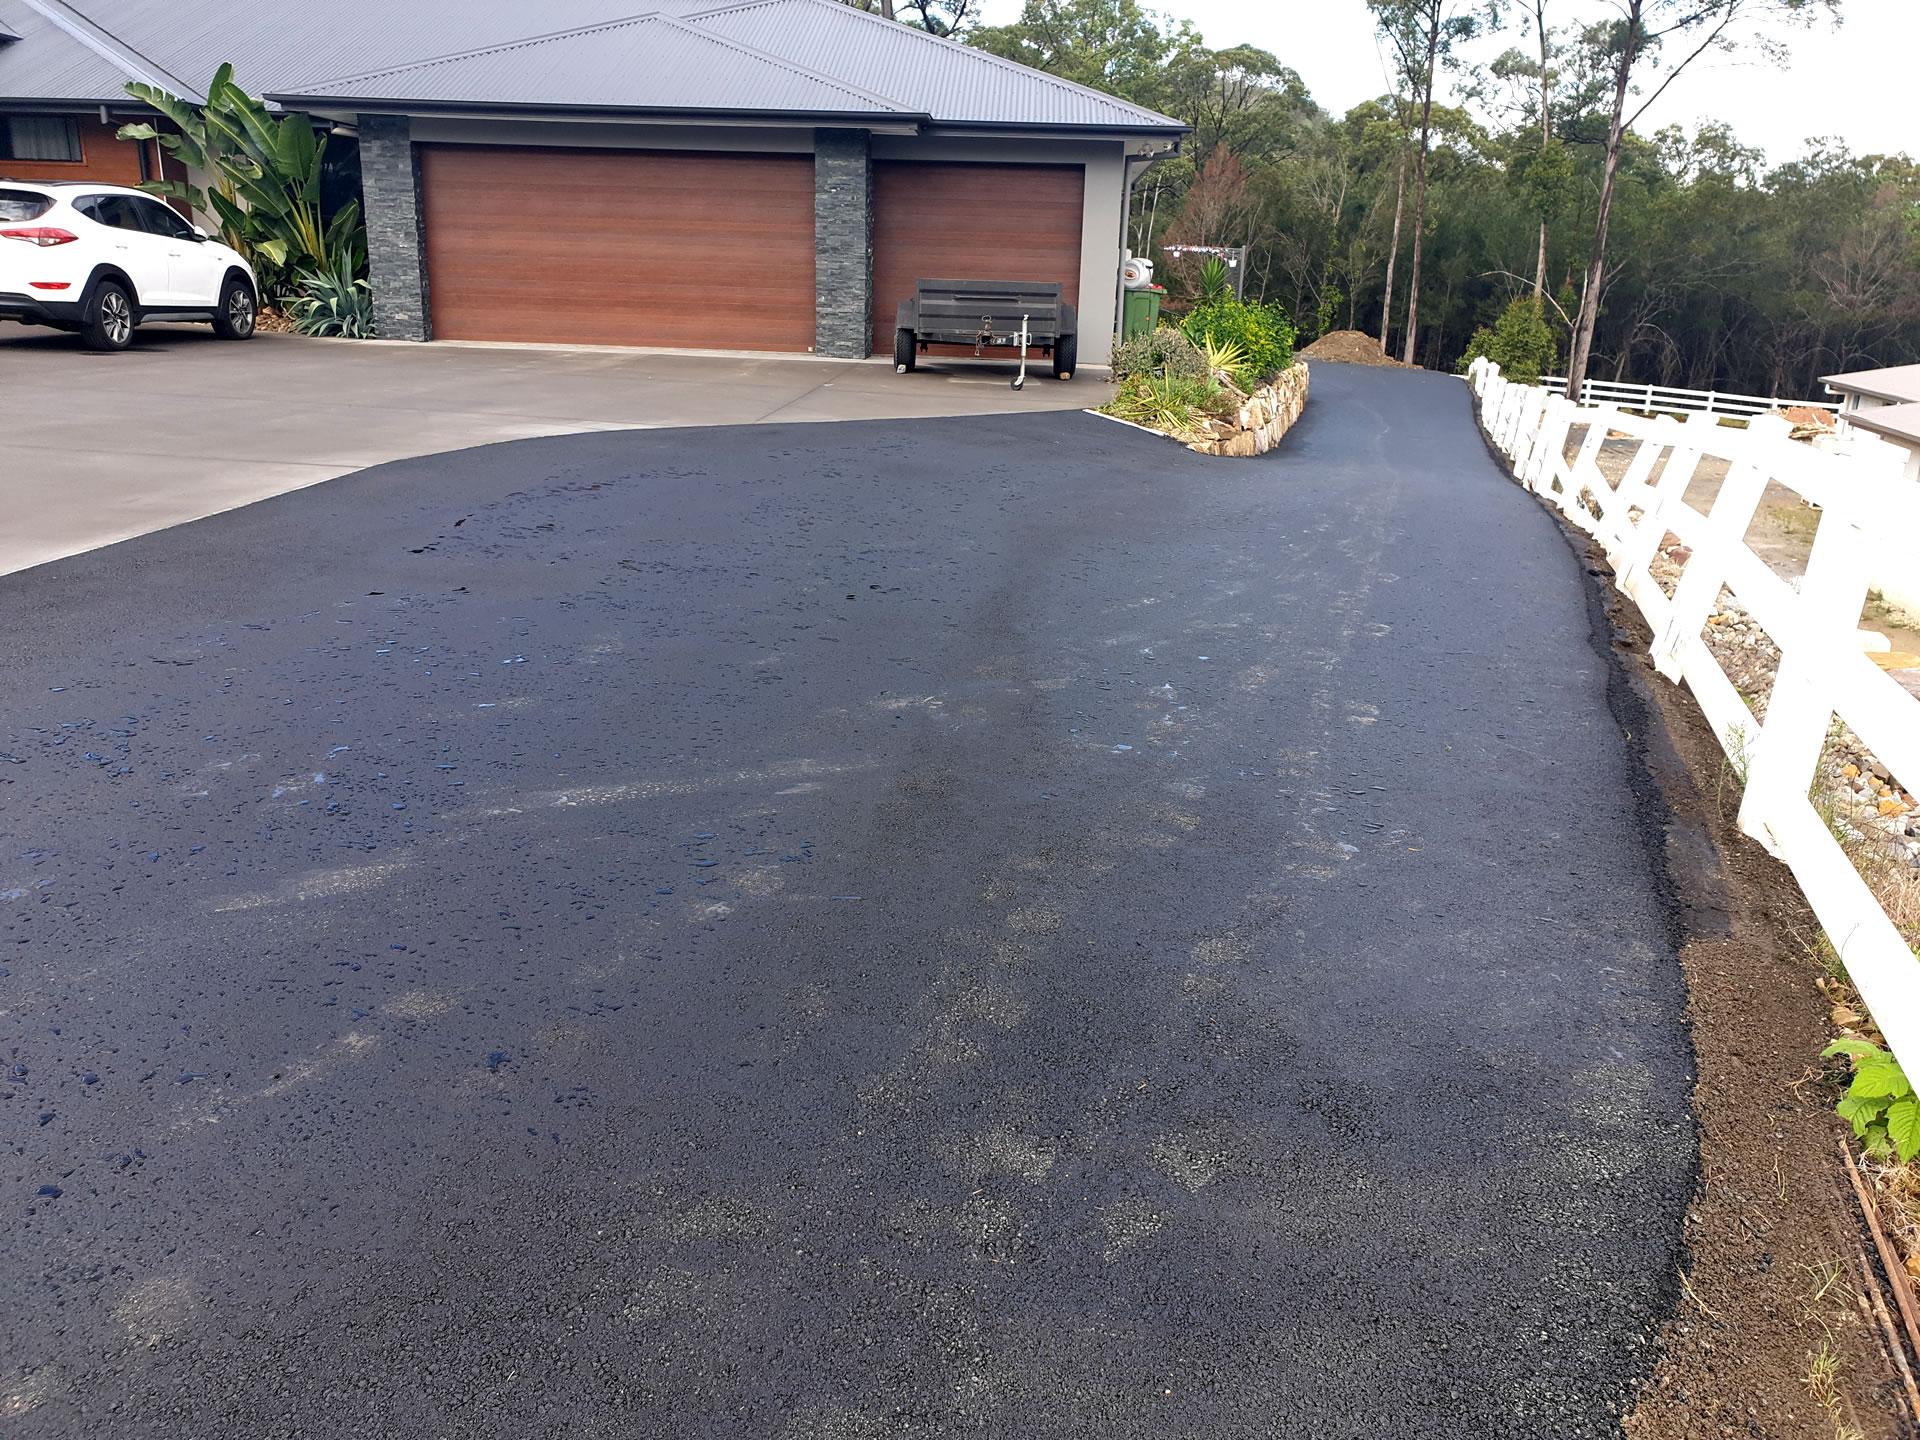 Acreage Asphalt driveway cut sealed Gold Coast Brisbane